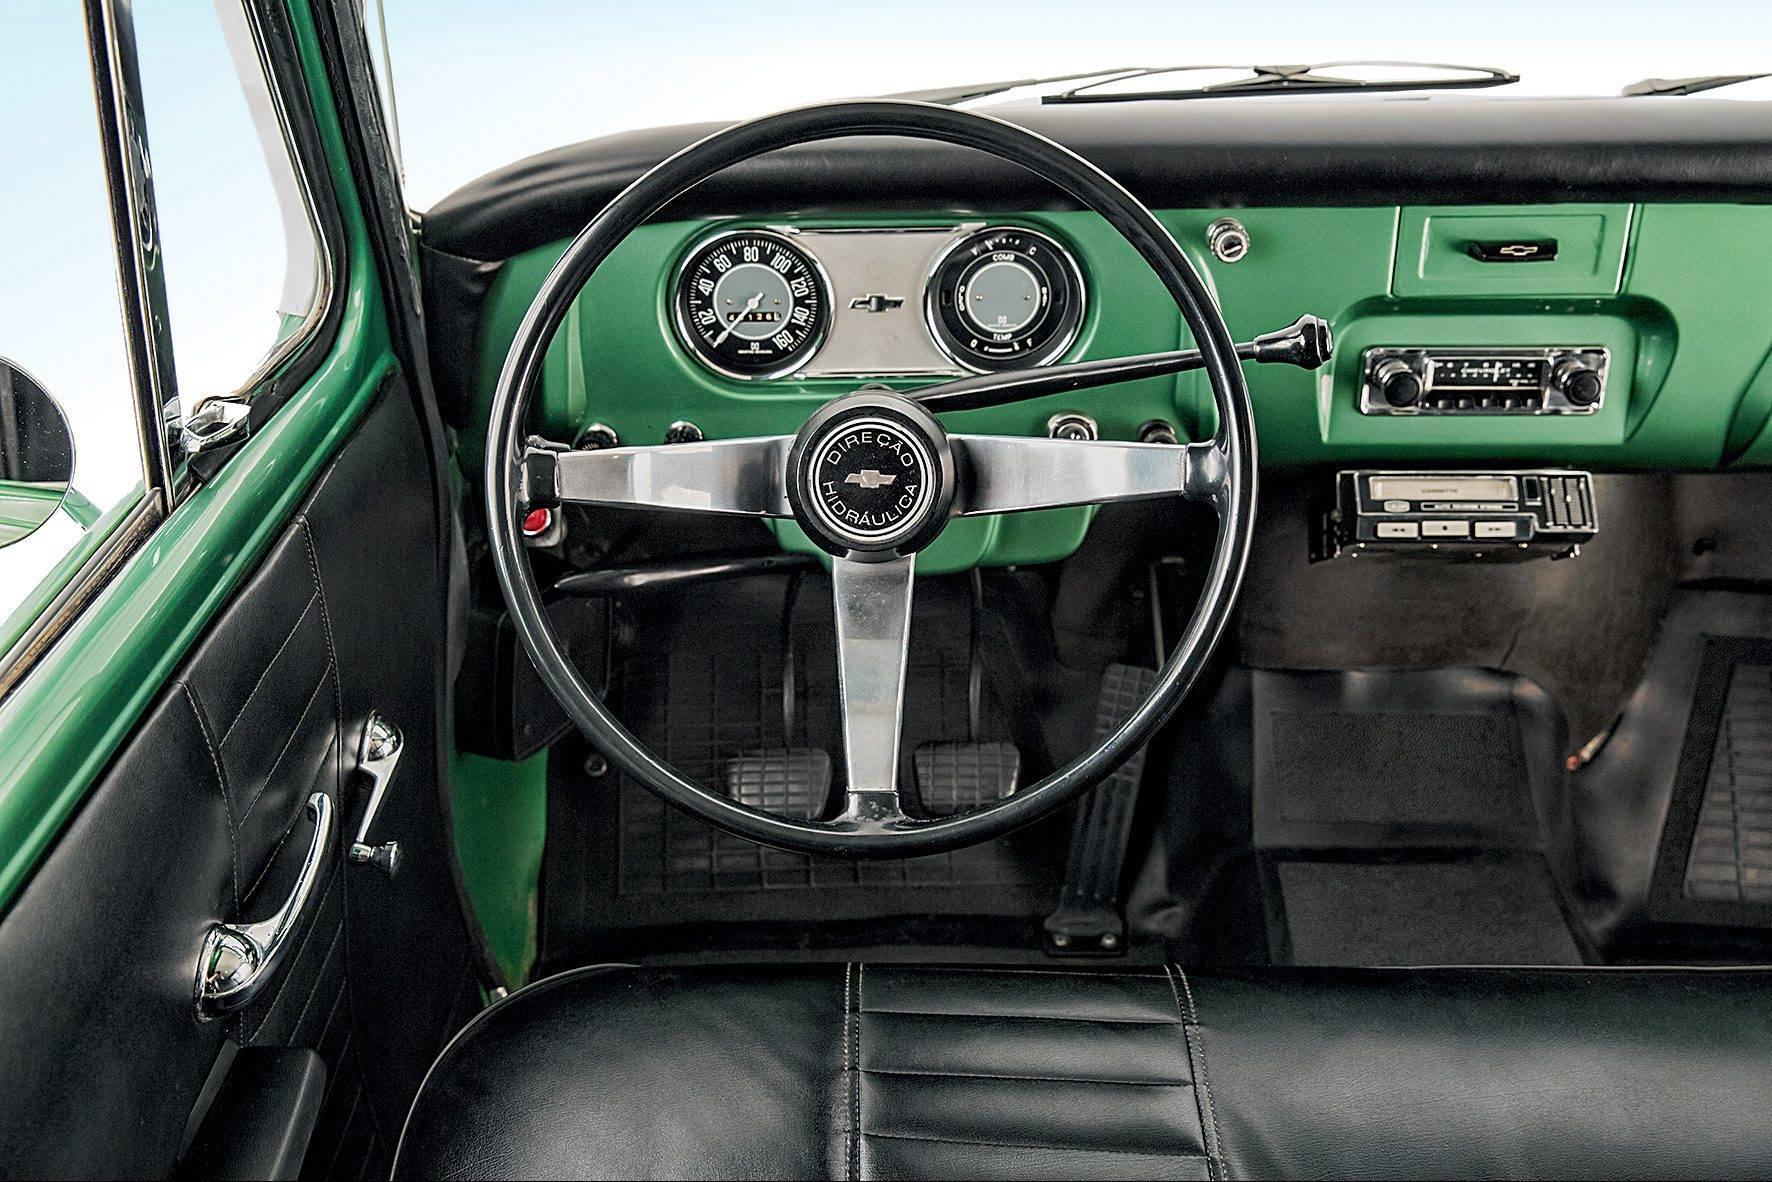 Chevrolet-Veraneio--1964--1994-C-1416-6